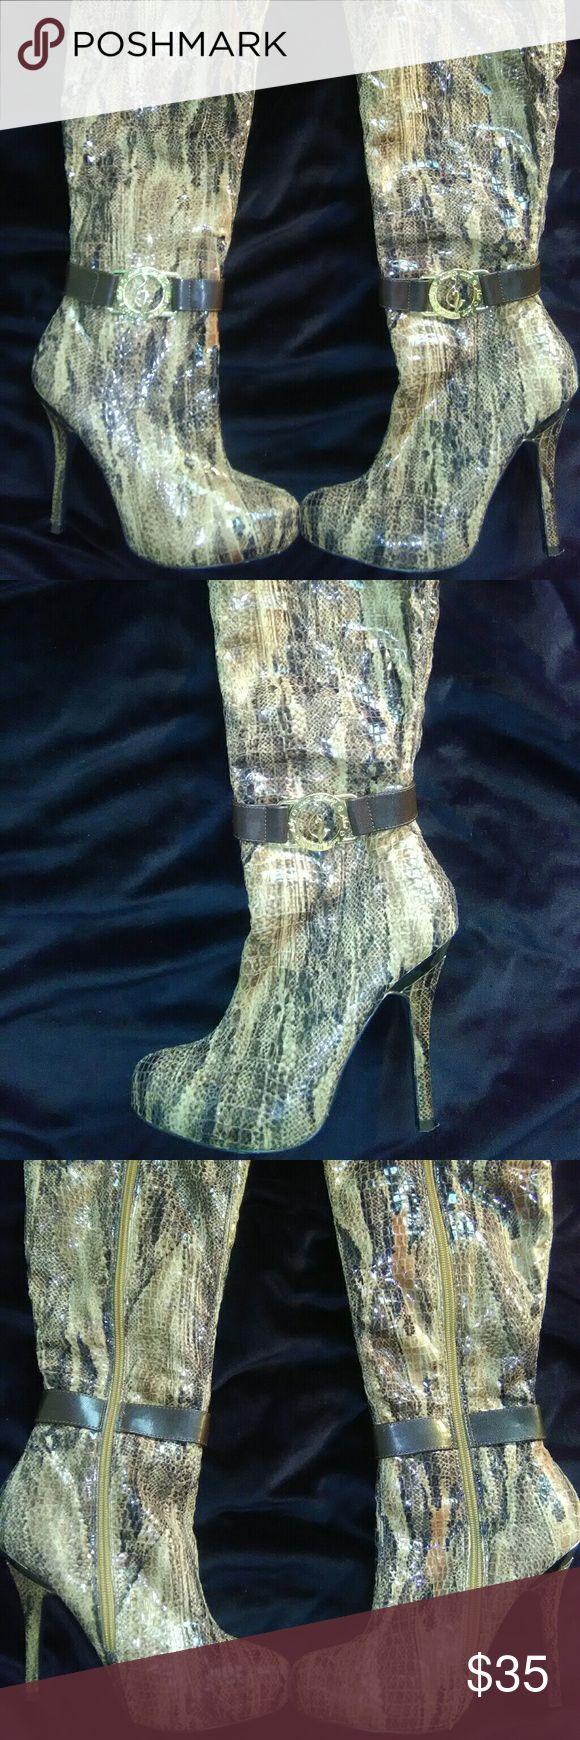 Selling this Baby Phat Snake Skin Heeled Boots on Poshmark! My username is: kiricloth. #shopmycloset #poshmark #fashion #shopping #style #forsale #Baby Phat #Shoes